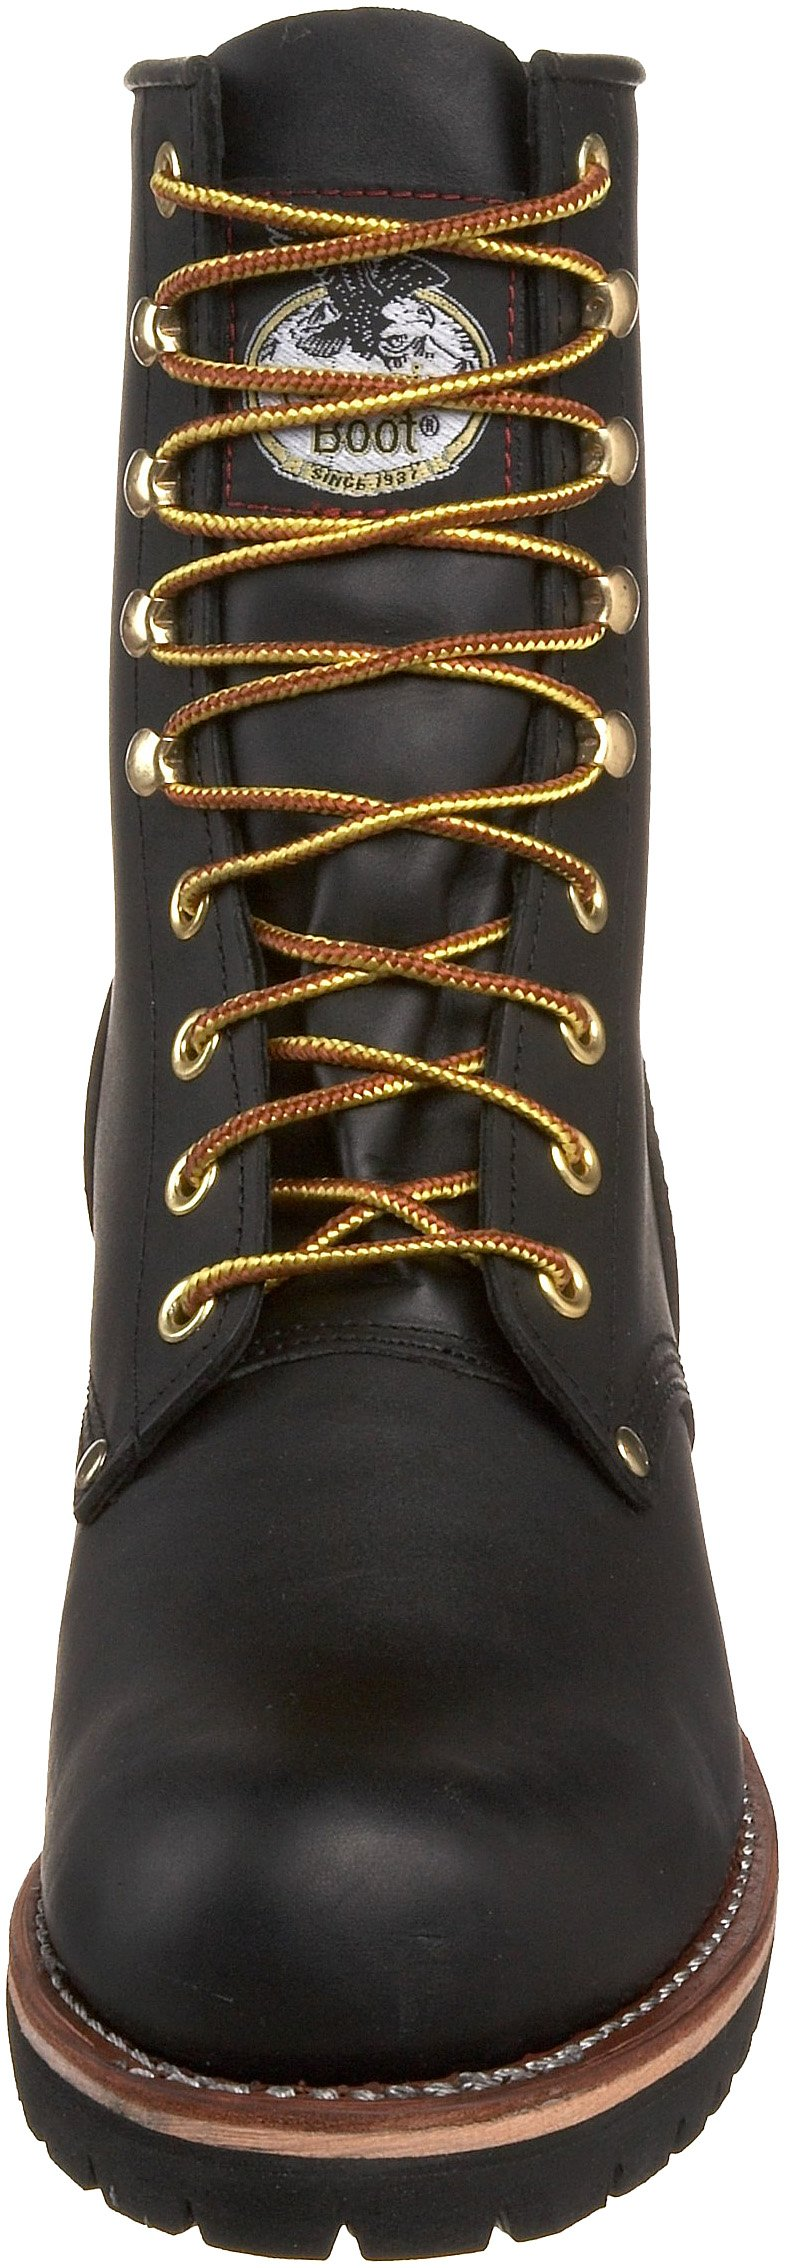 Georgia Boot Men's Logger 8'' Black Non Steel,Oily Black,5 M US by Georgia Boot (Image #4)